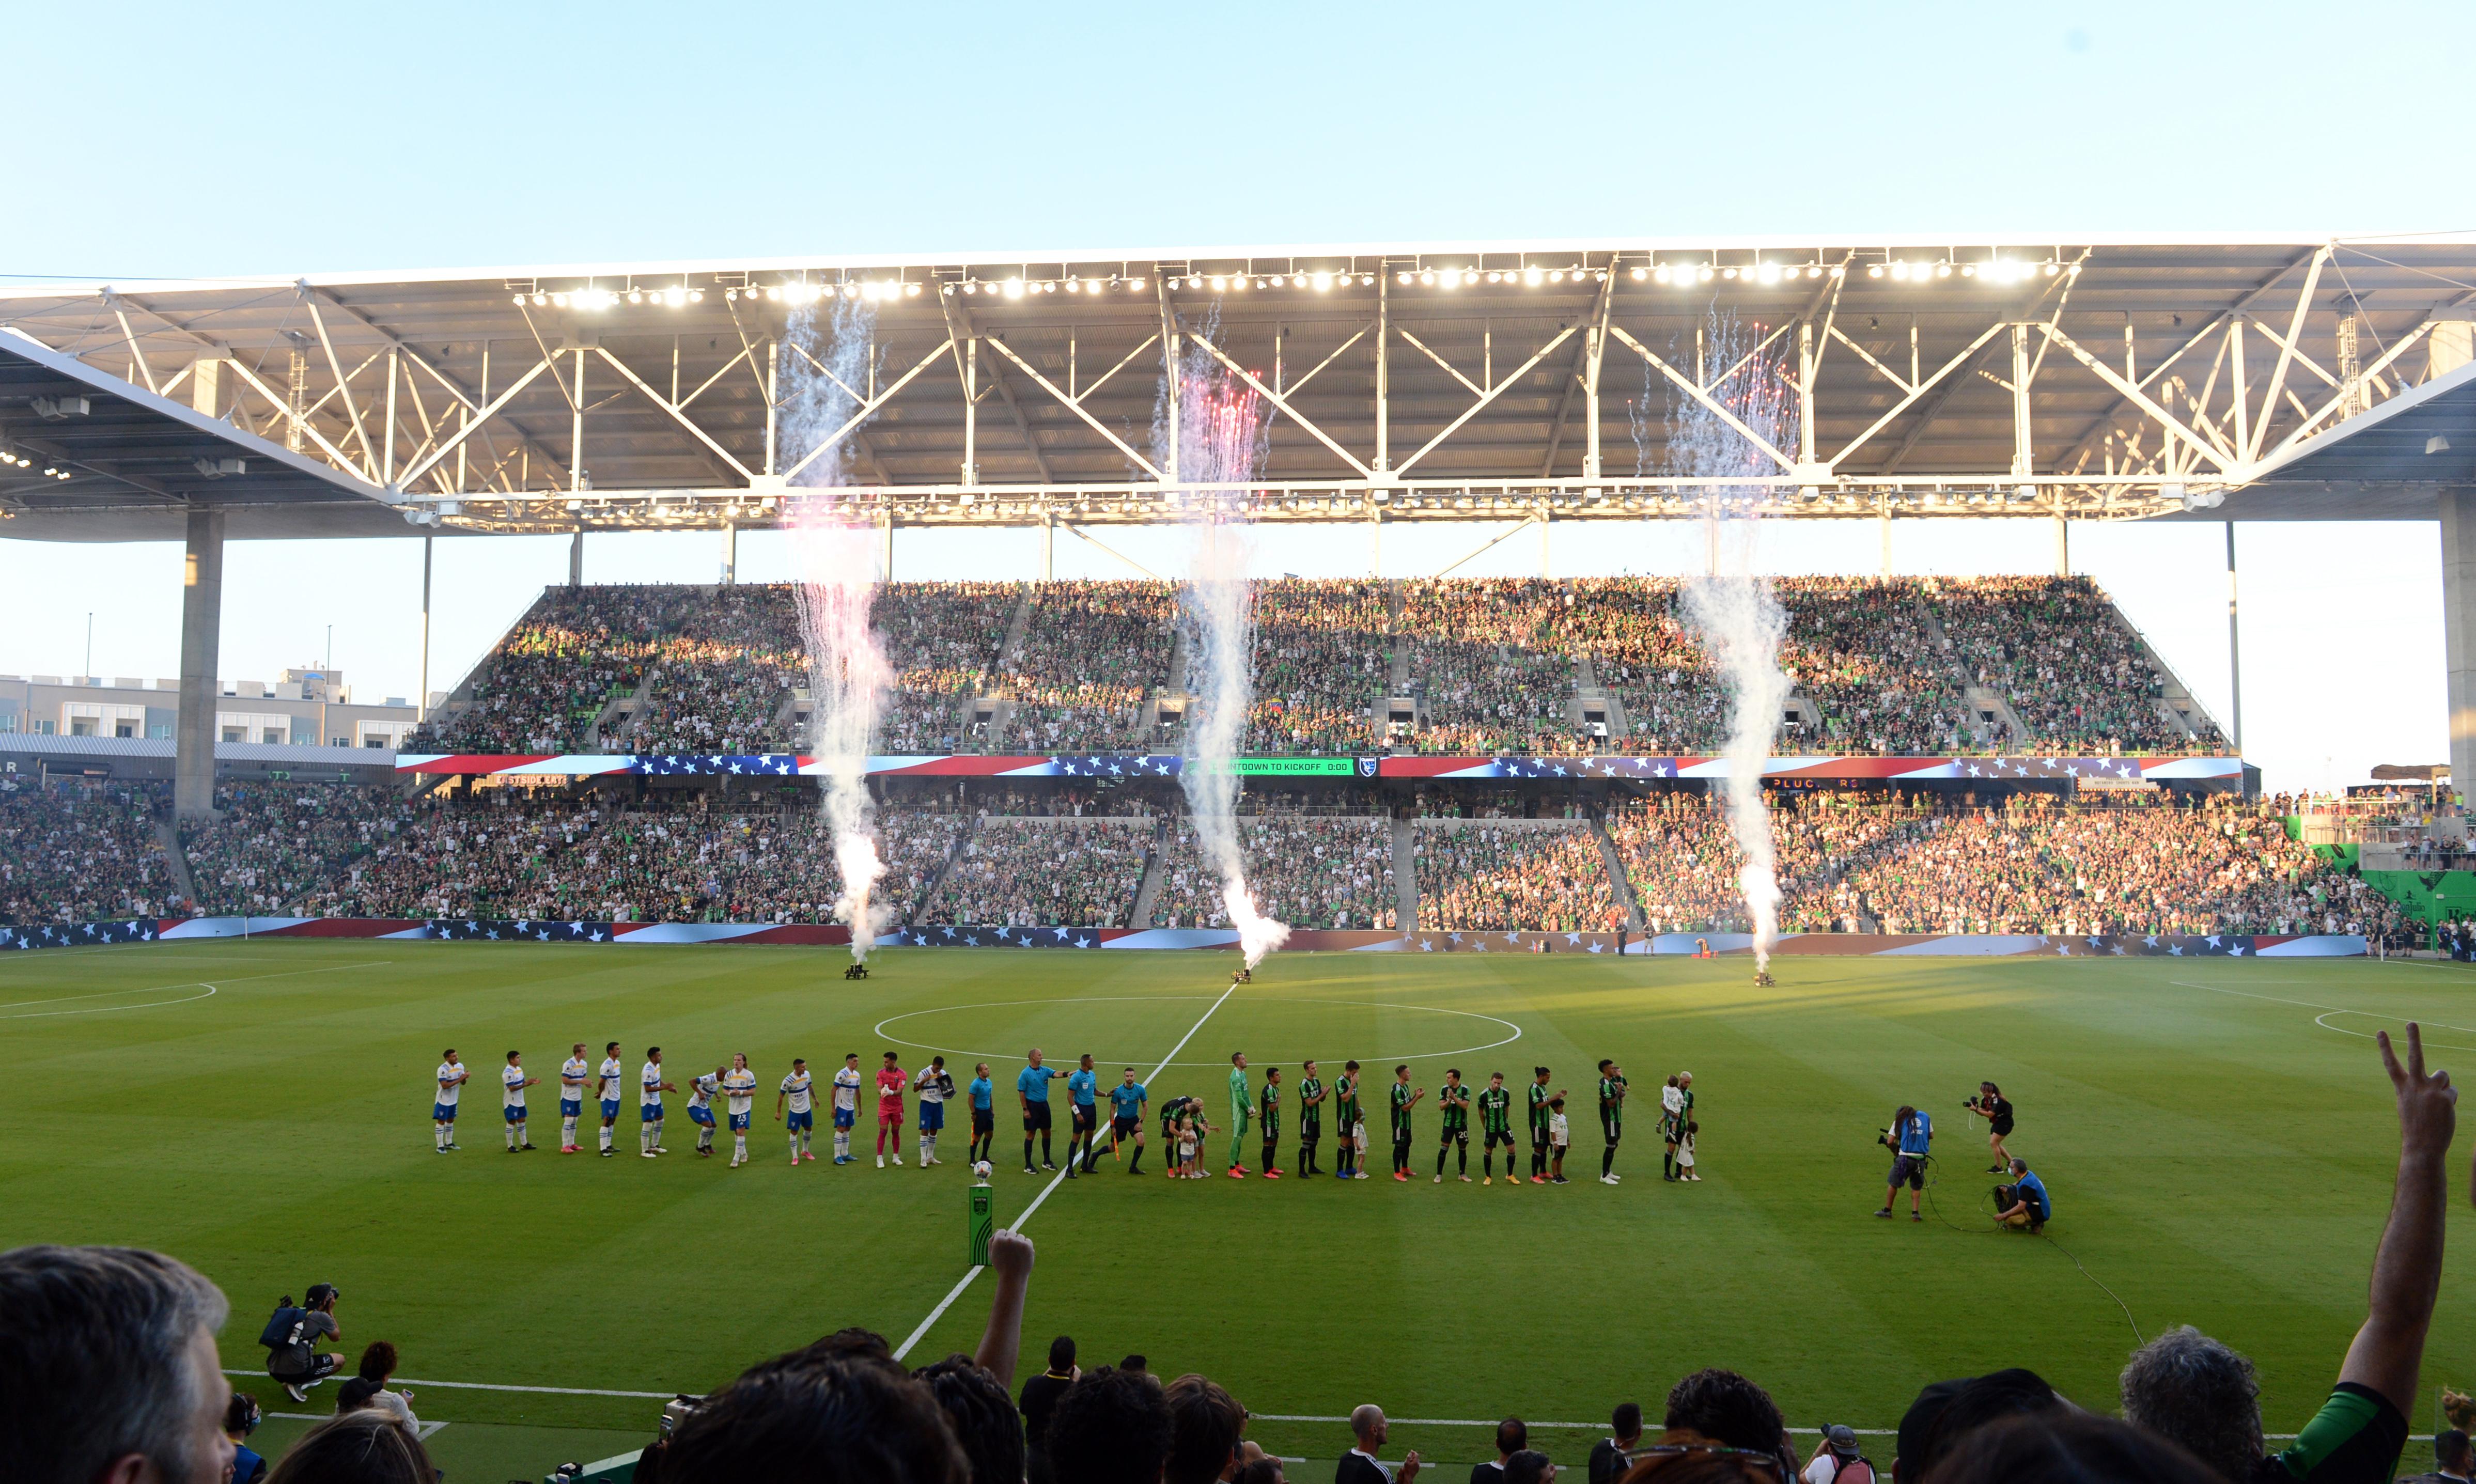 SOCCER: JUN 19 MLS - San Jose Earthquakes at Austin FC